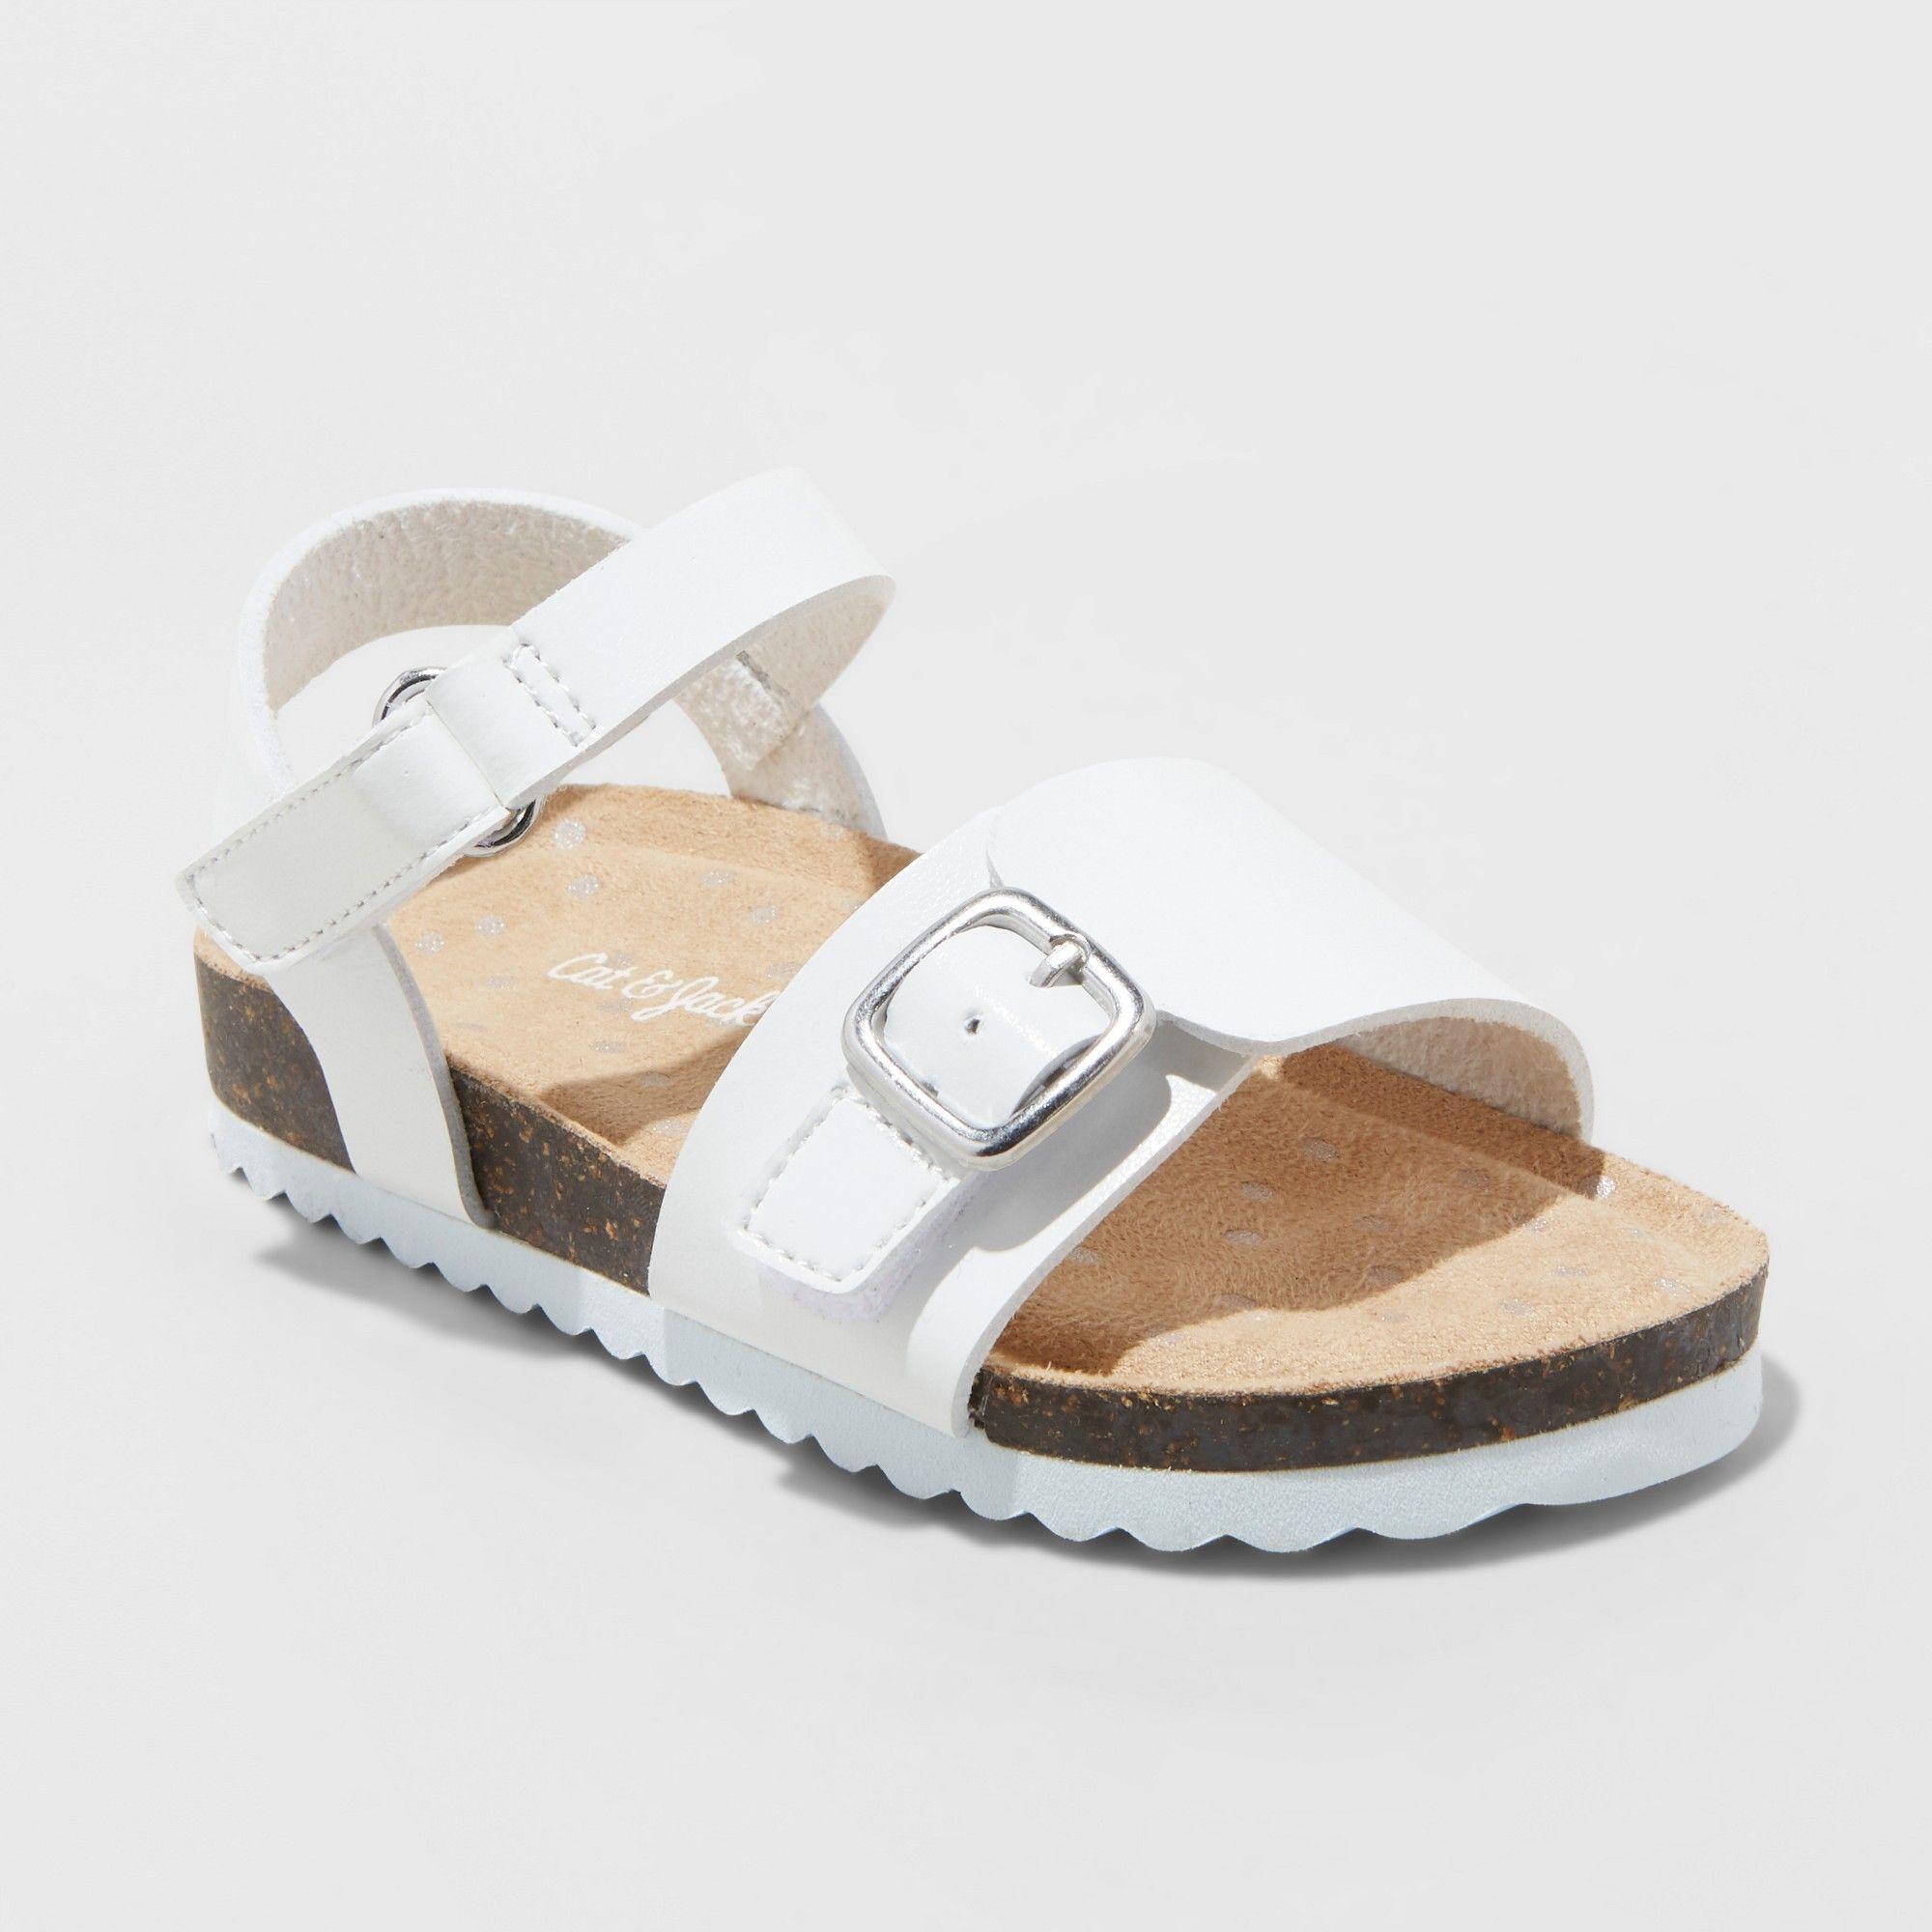 0c2e61cf811b Toddler Girls  Berdie Comfort Foodbed Sandals - Cat   Jack White 11 ...